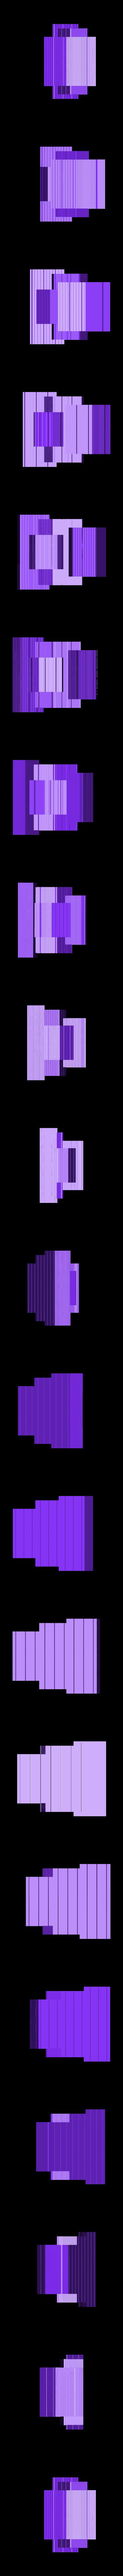 Color4_Windows.stl Download free STL file Nordic-Inspired Multi-color Architectural Model • 3D printer model, MosaicManufacturing